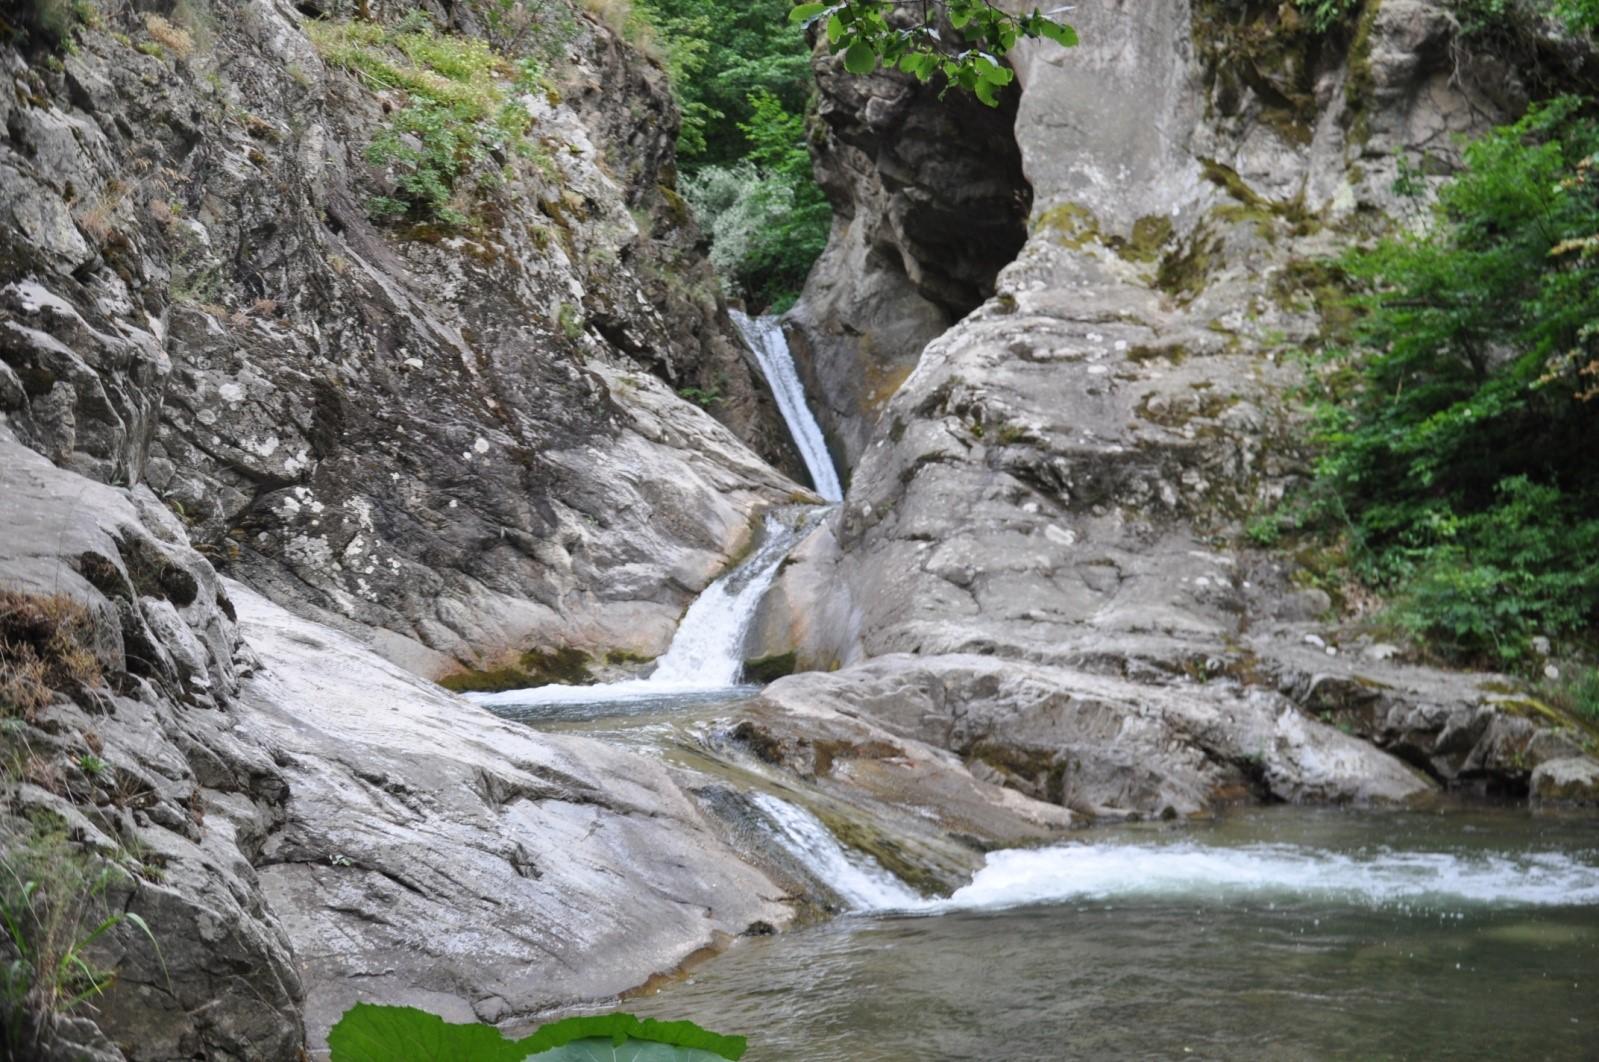 Живописните водопади на р. Твърдишка